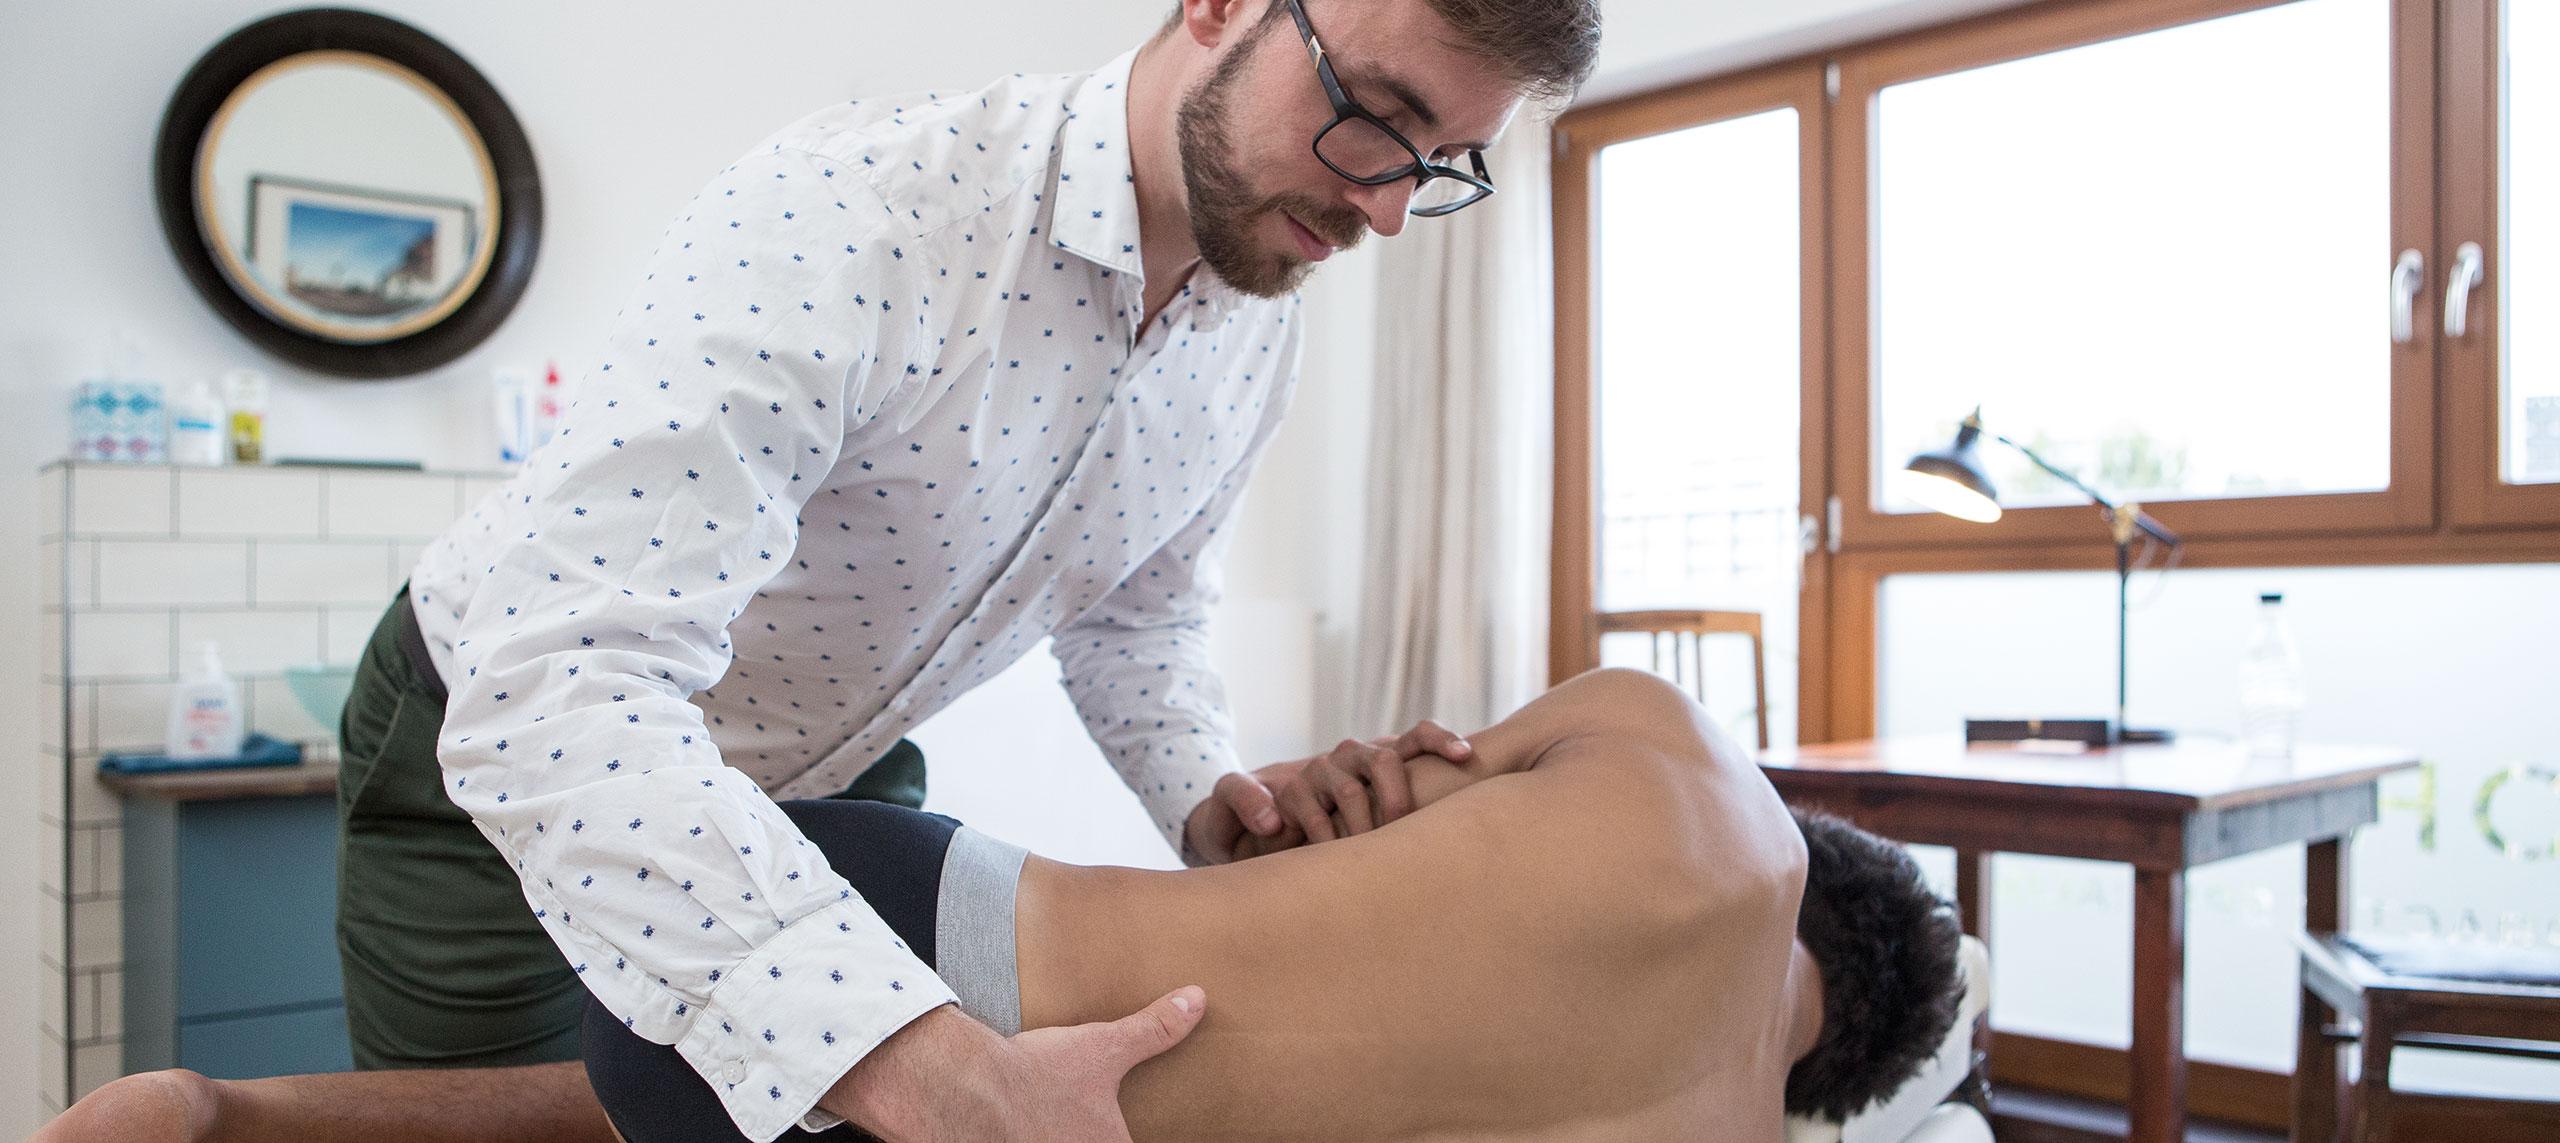 Chirohouse Chiropraktiker Berlin behandelt Hexenschuss und chronische Schmerzen im unteren Rücken - www.chirohouse.de - Berlin Mitte